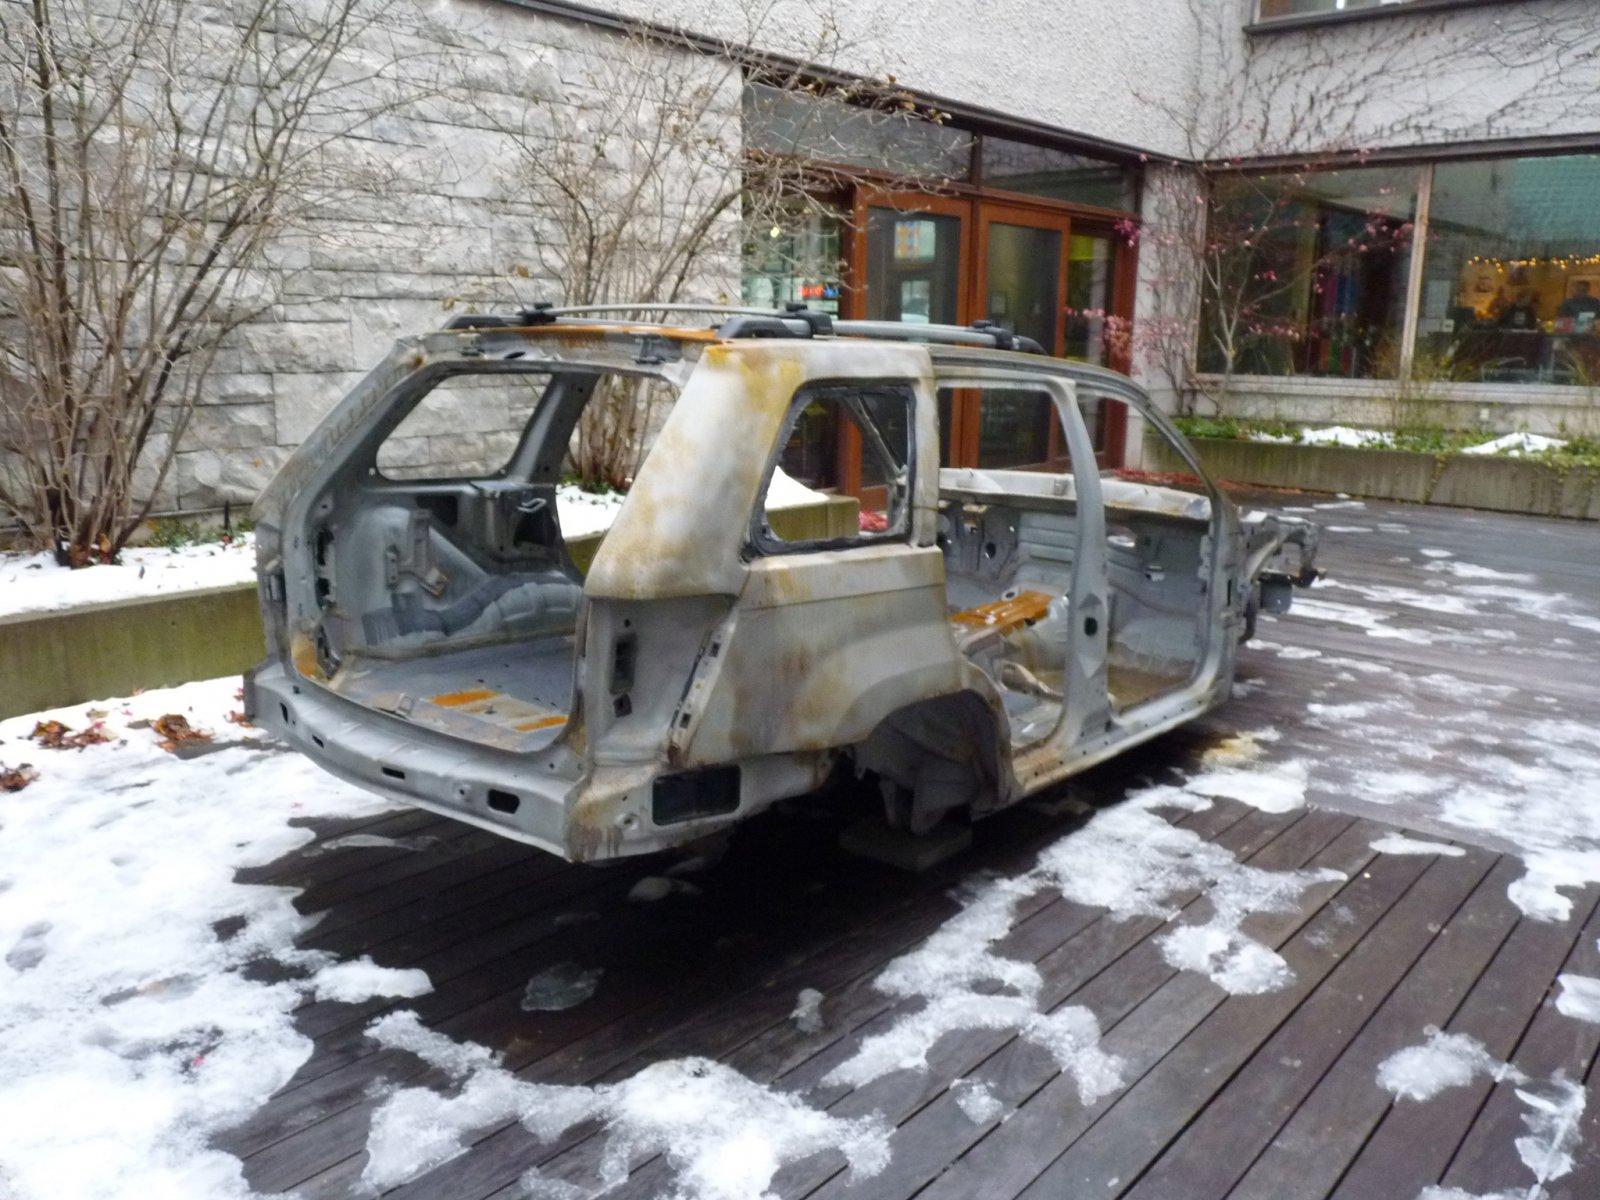 Duane Linklater, 2005 Grand Jeep Cherokee, 2013, steel frame of artist's vehicle. dimensions variable